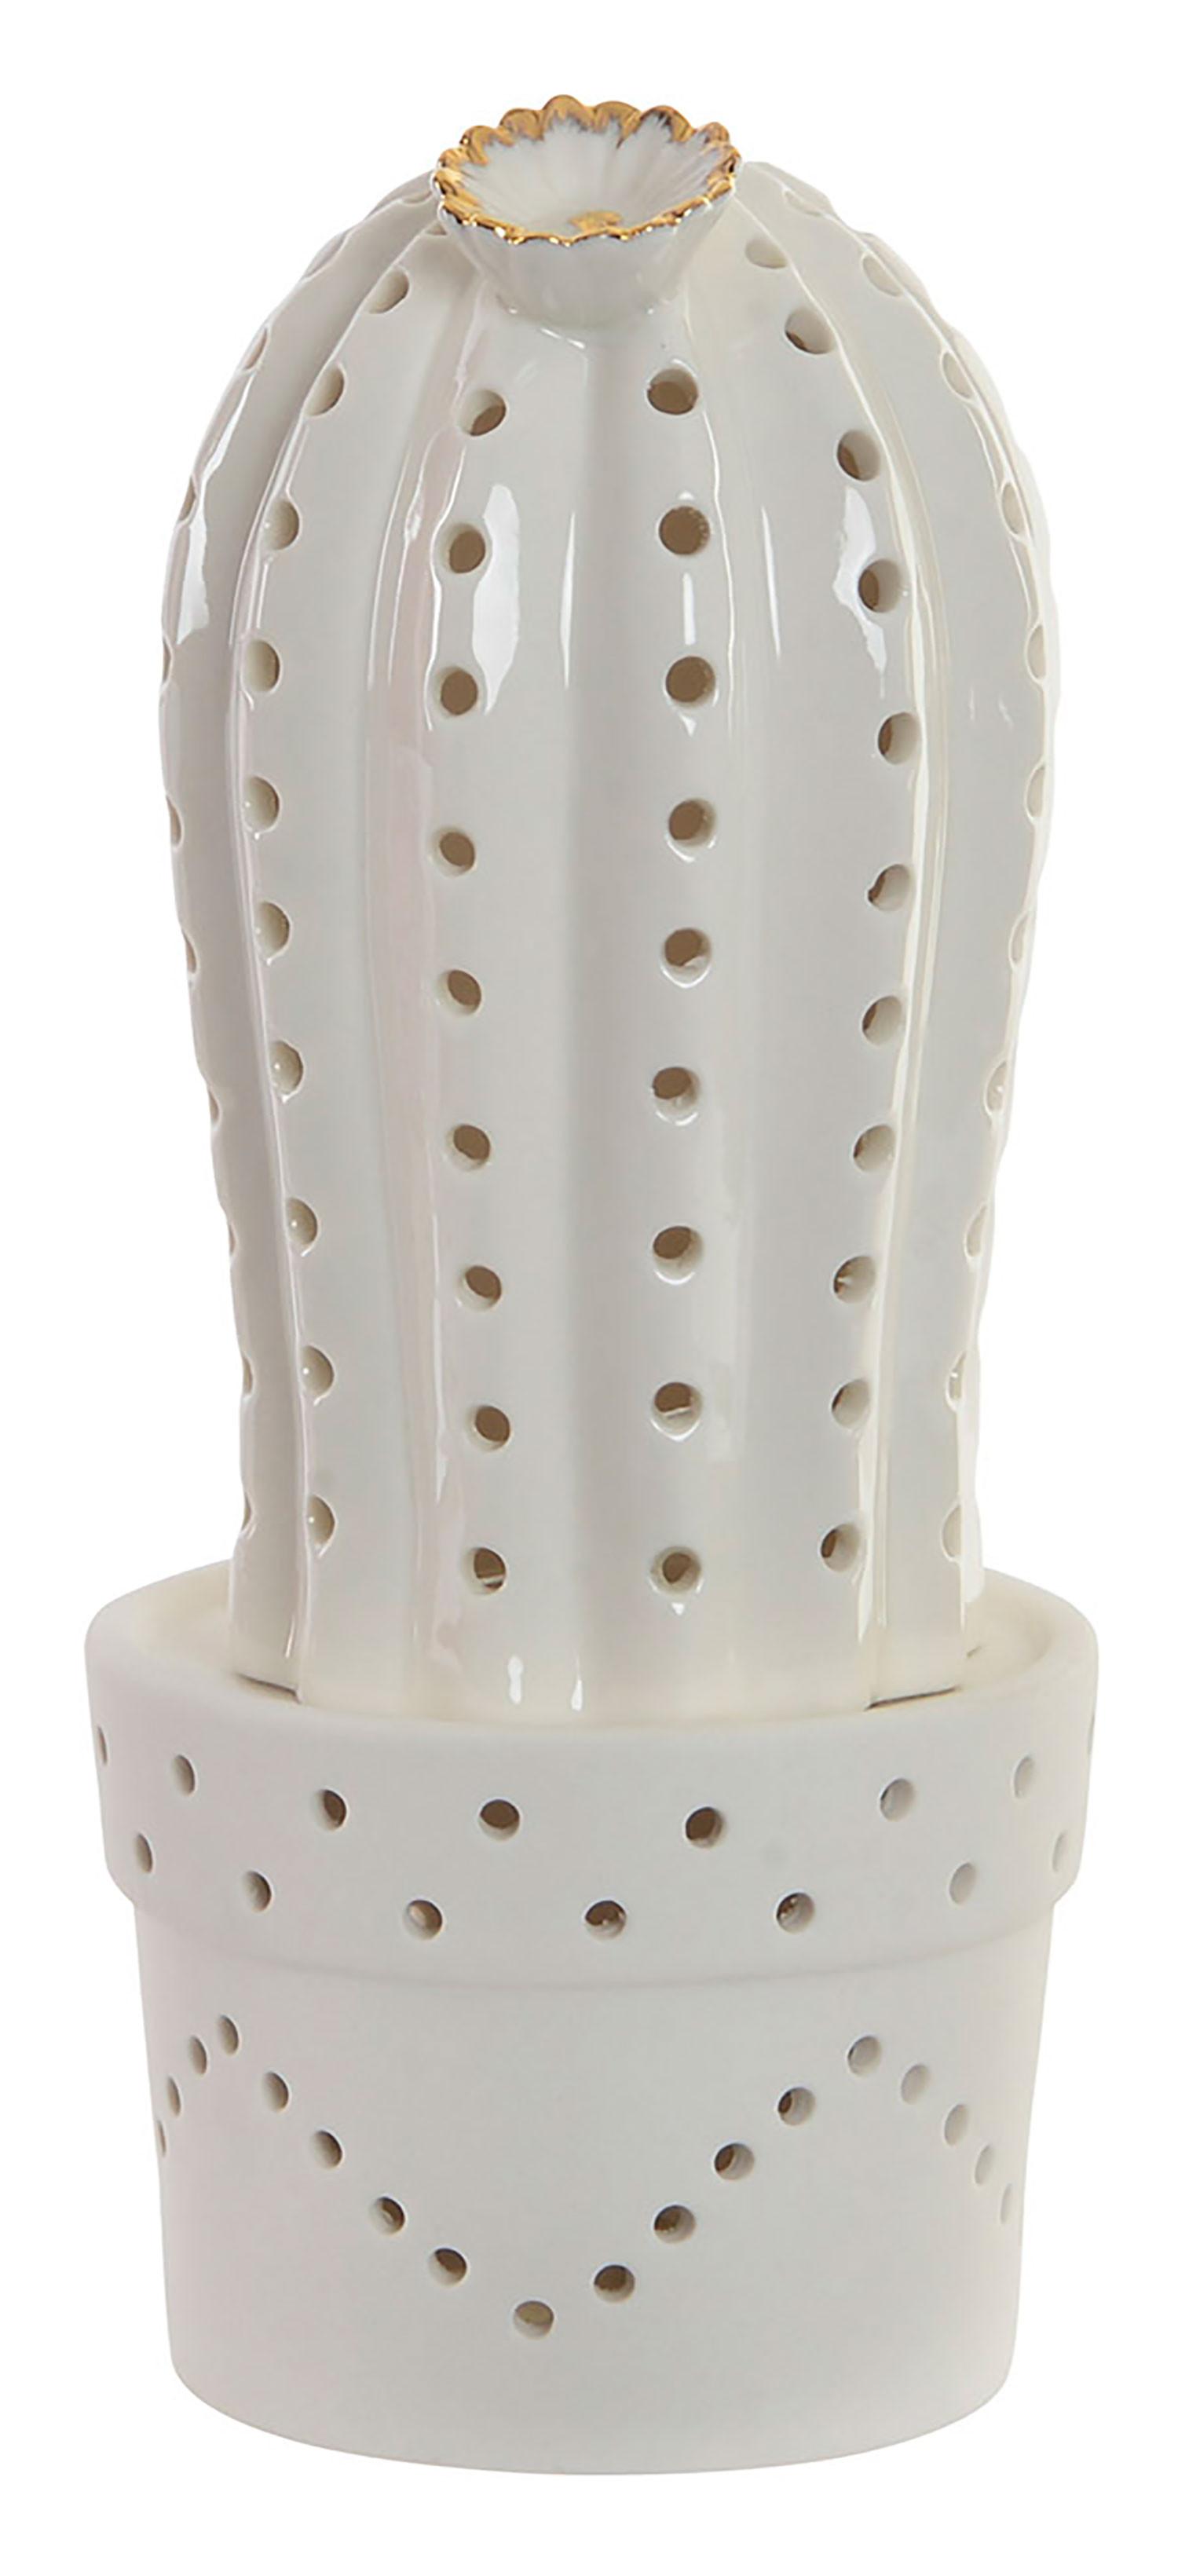 Led lamp, Figure of decorating Gress, design of Cactus in White color 11X11X26 cm